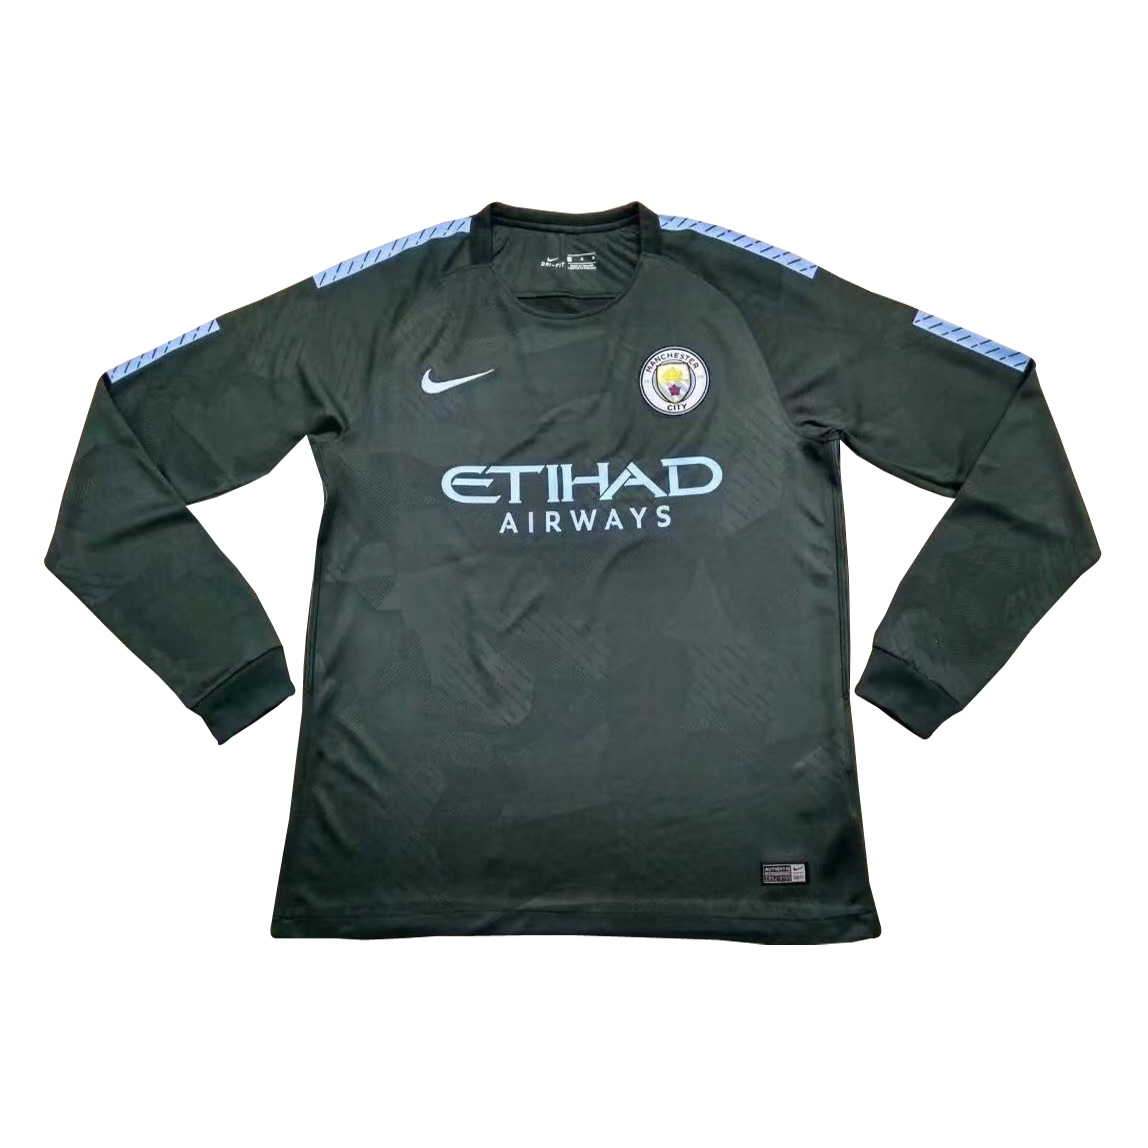 manchester city long sleeve shirt - techinternationalcorp.com e8f8b3841f5c